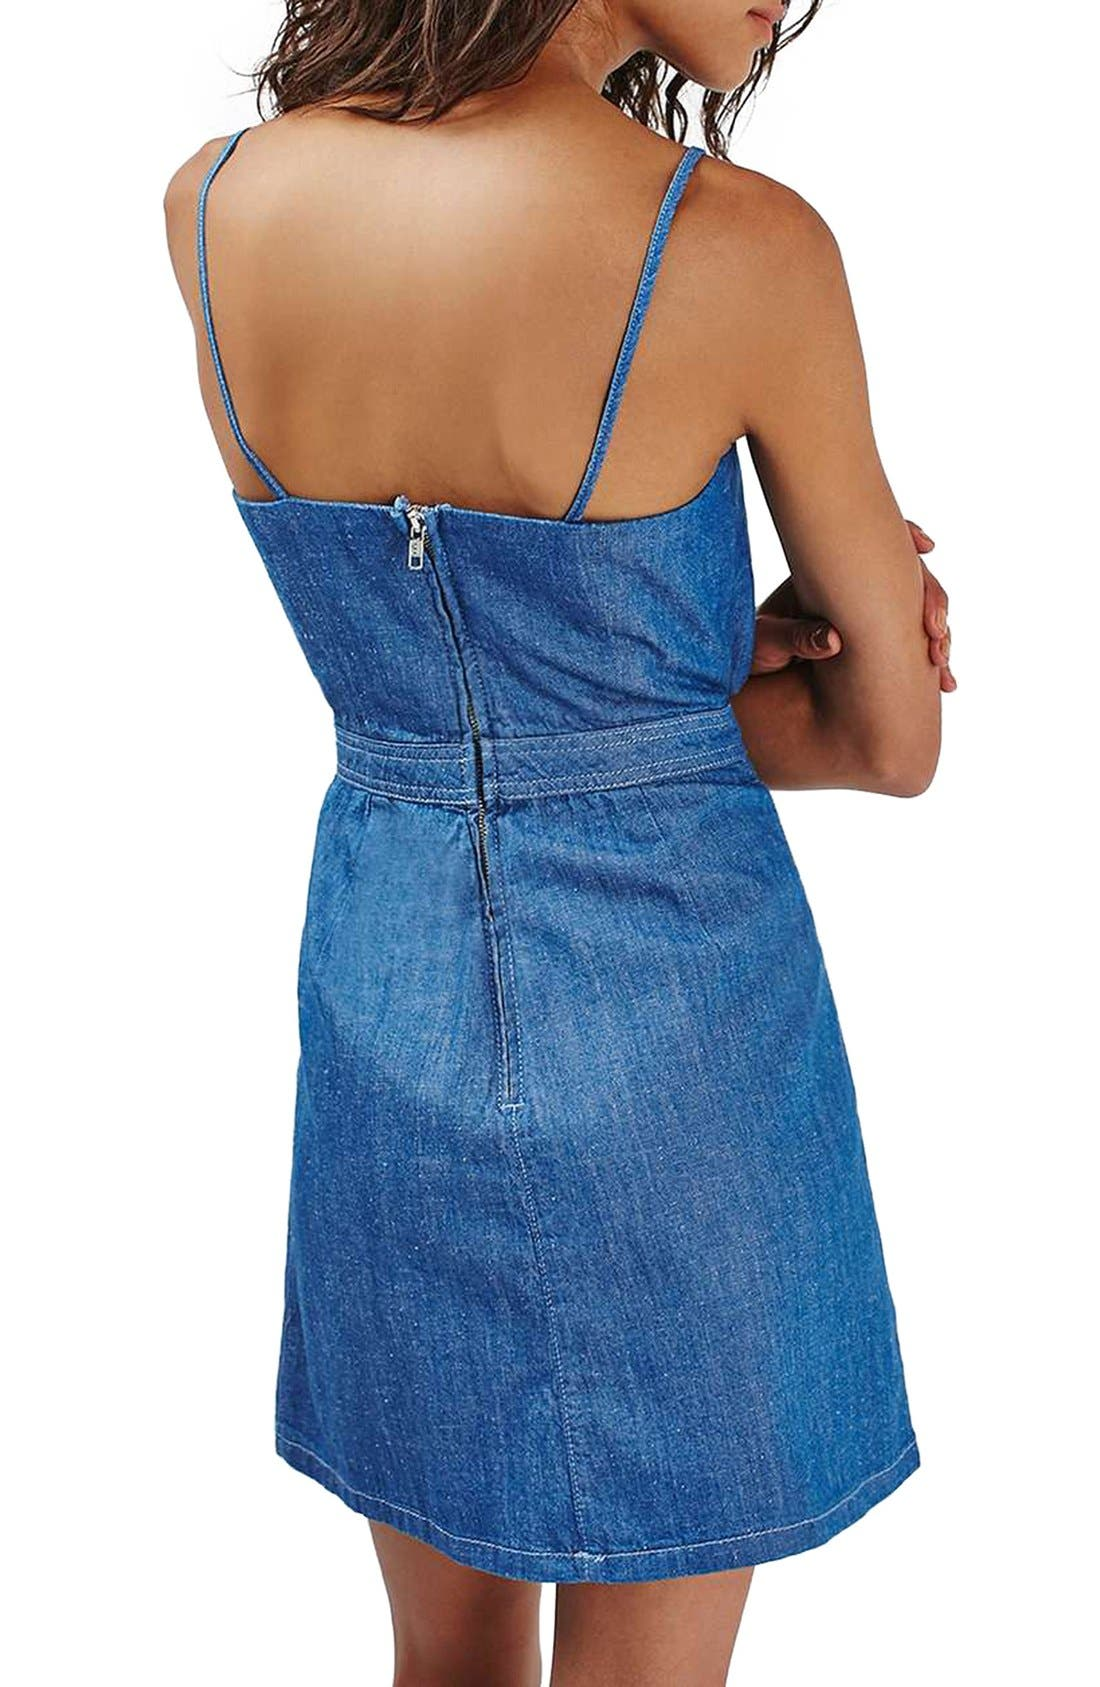 Alternate Image 2  - Topshop Bow Front Denim Minidress (Petite)